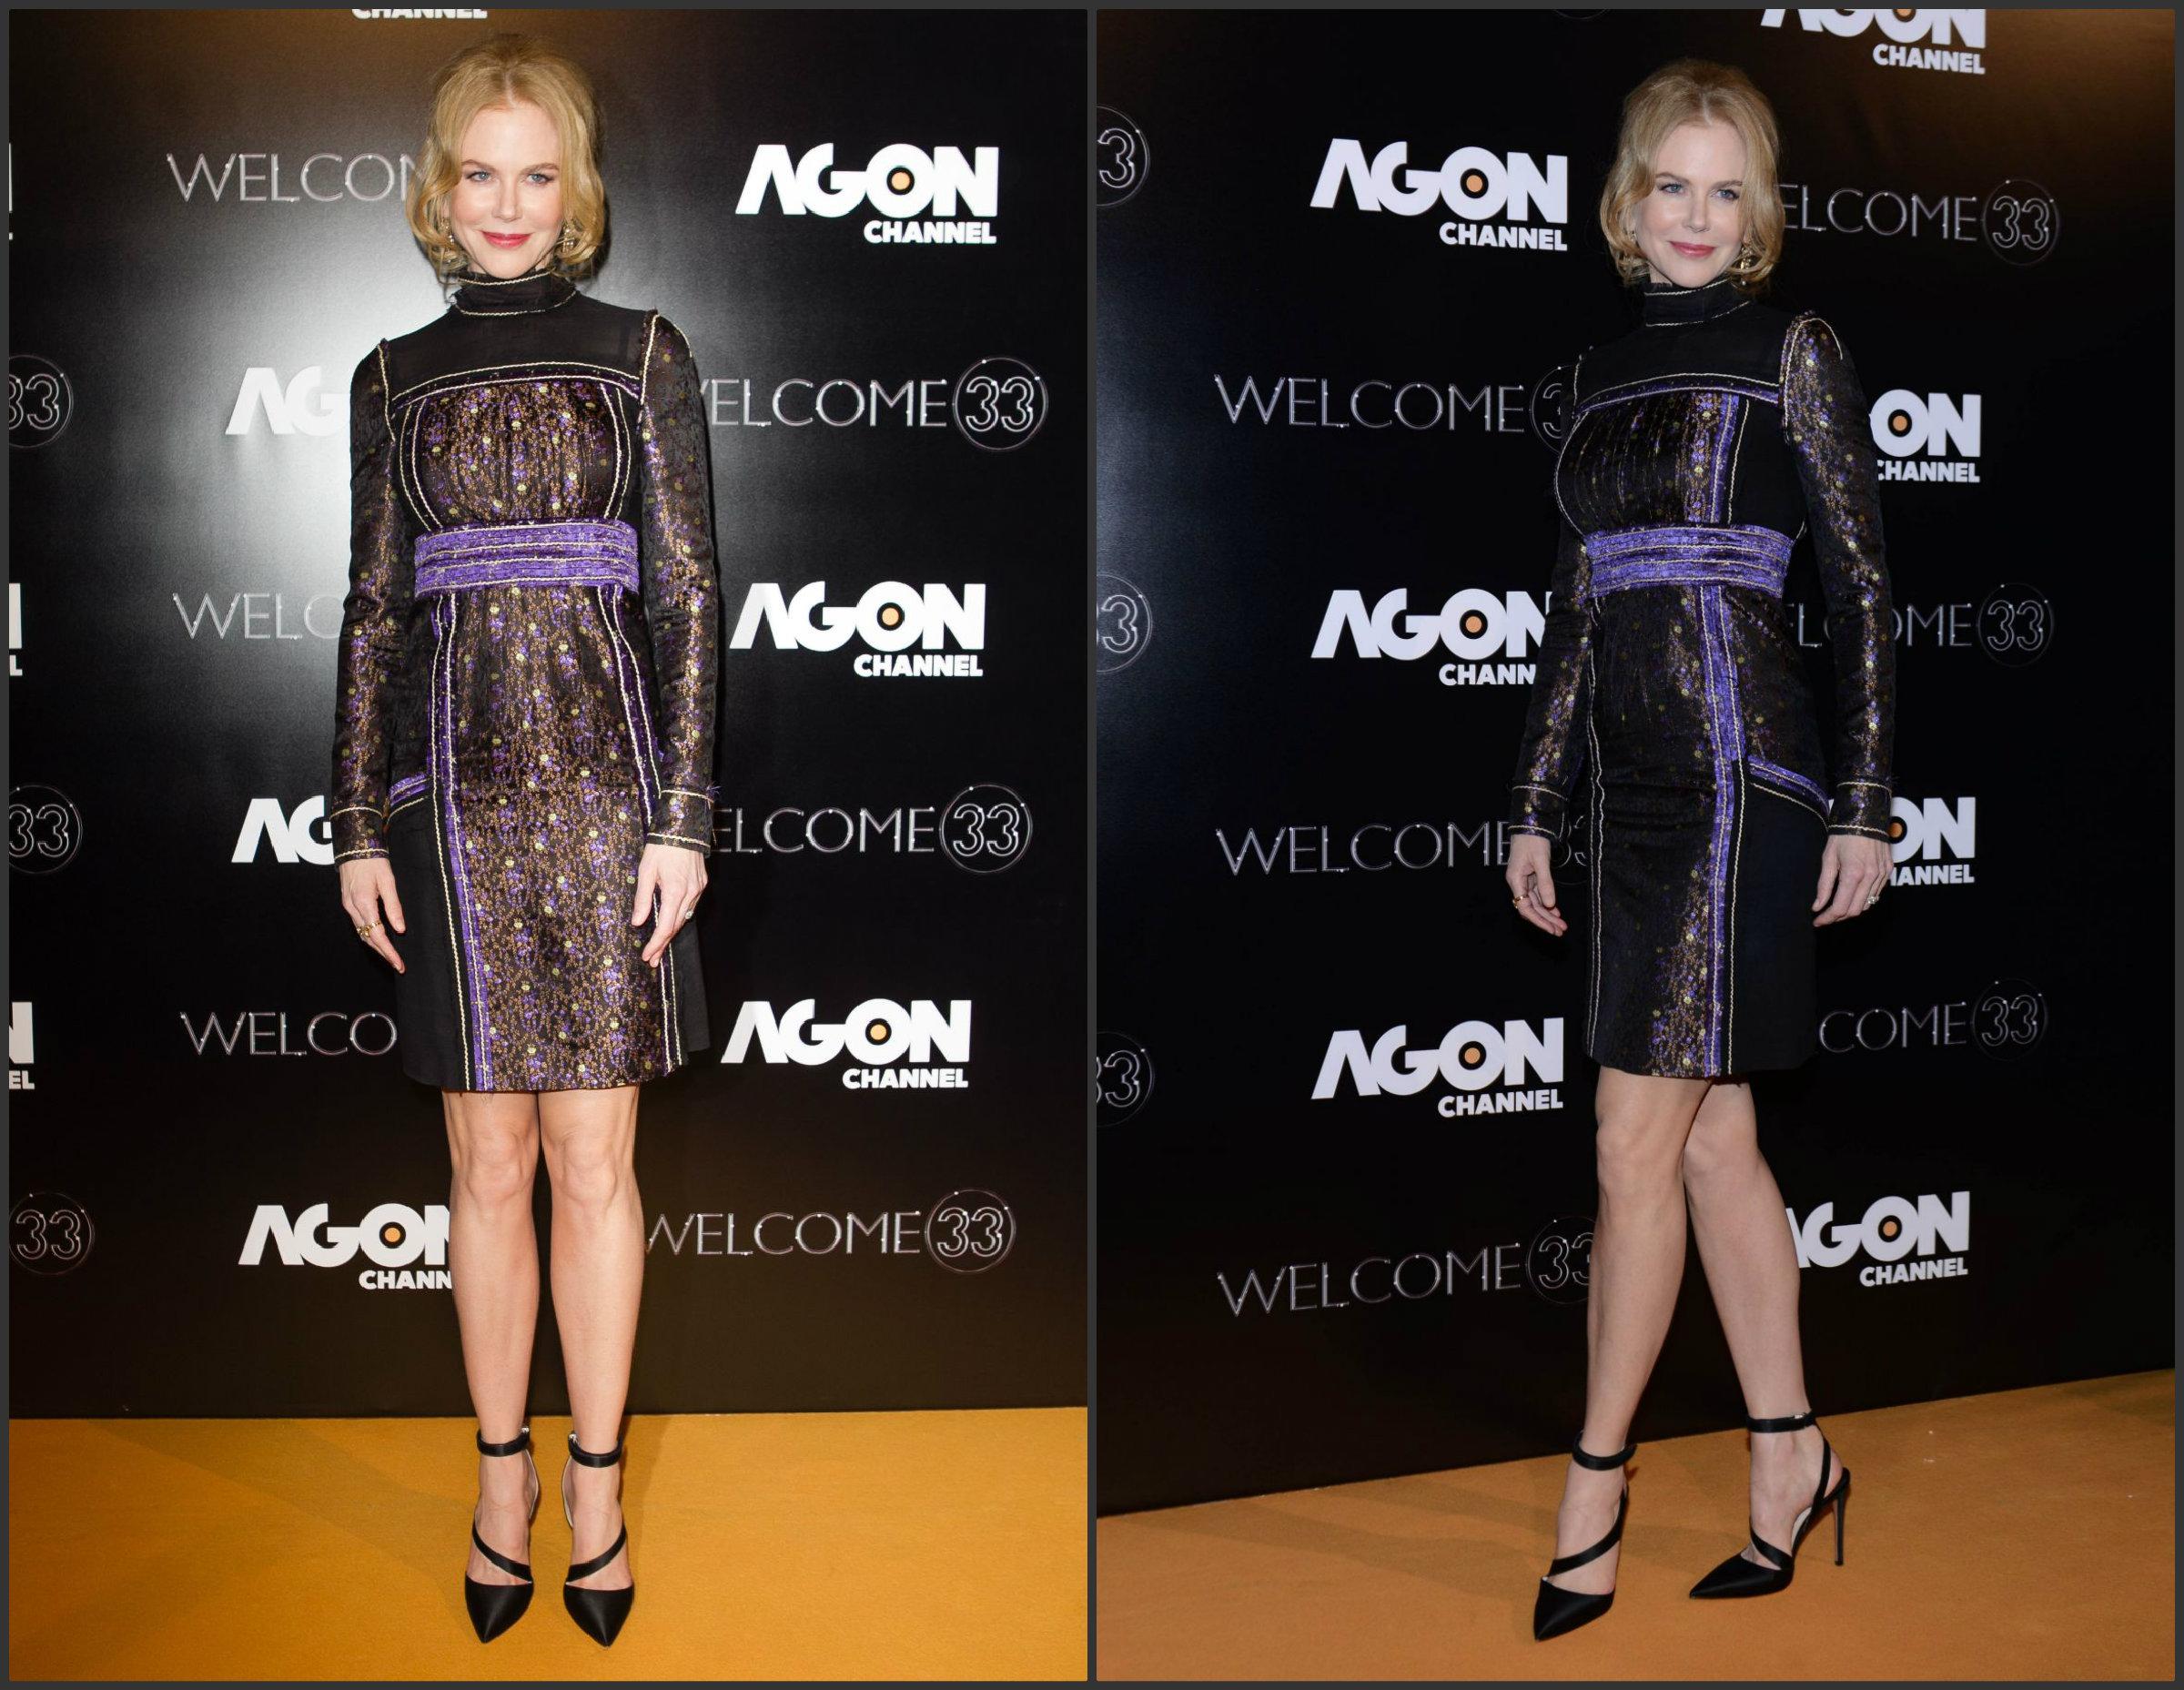 Nicole-Kidman-prada-agon-channel-launch-party